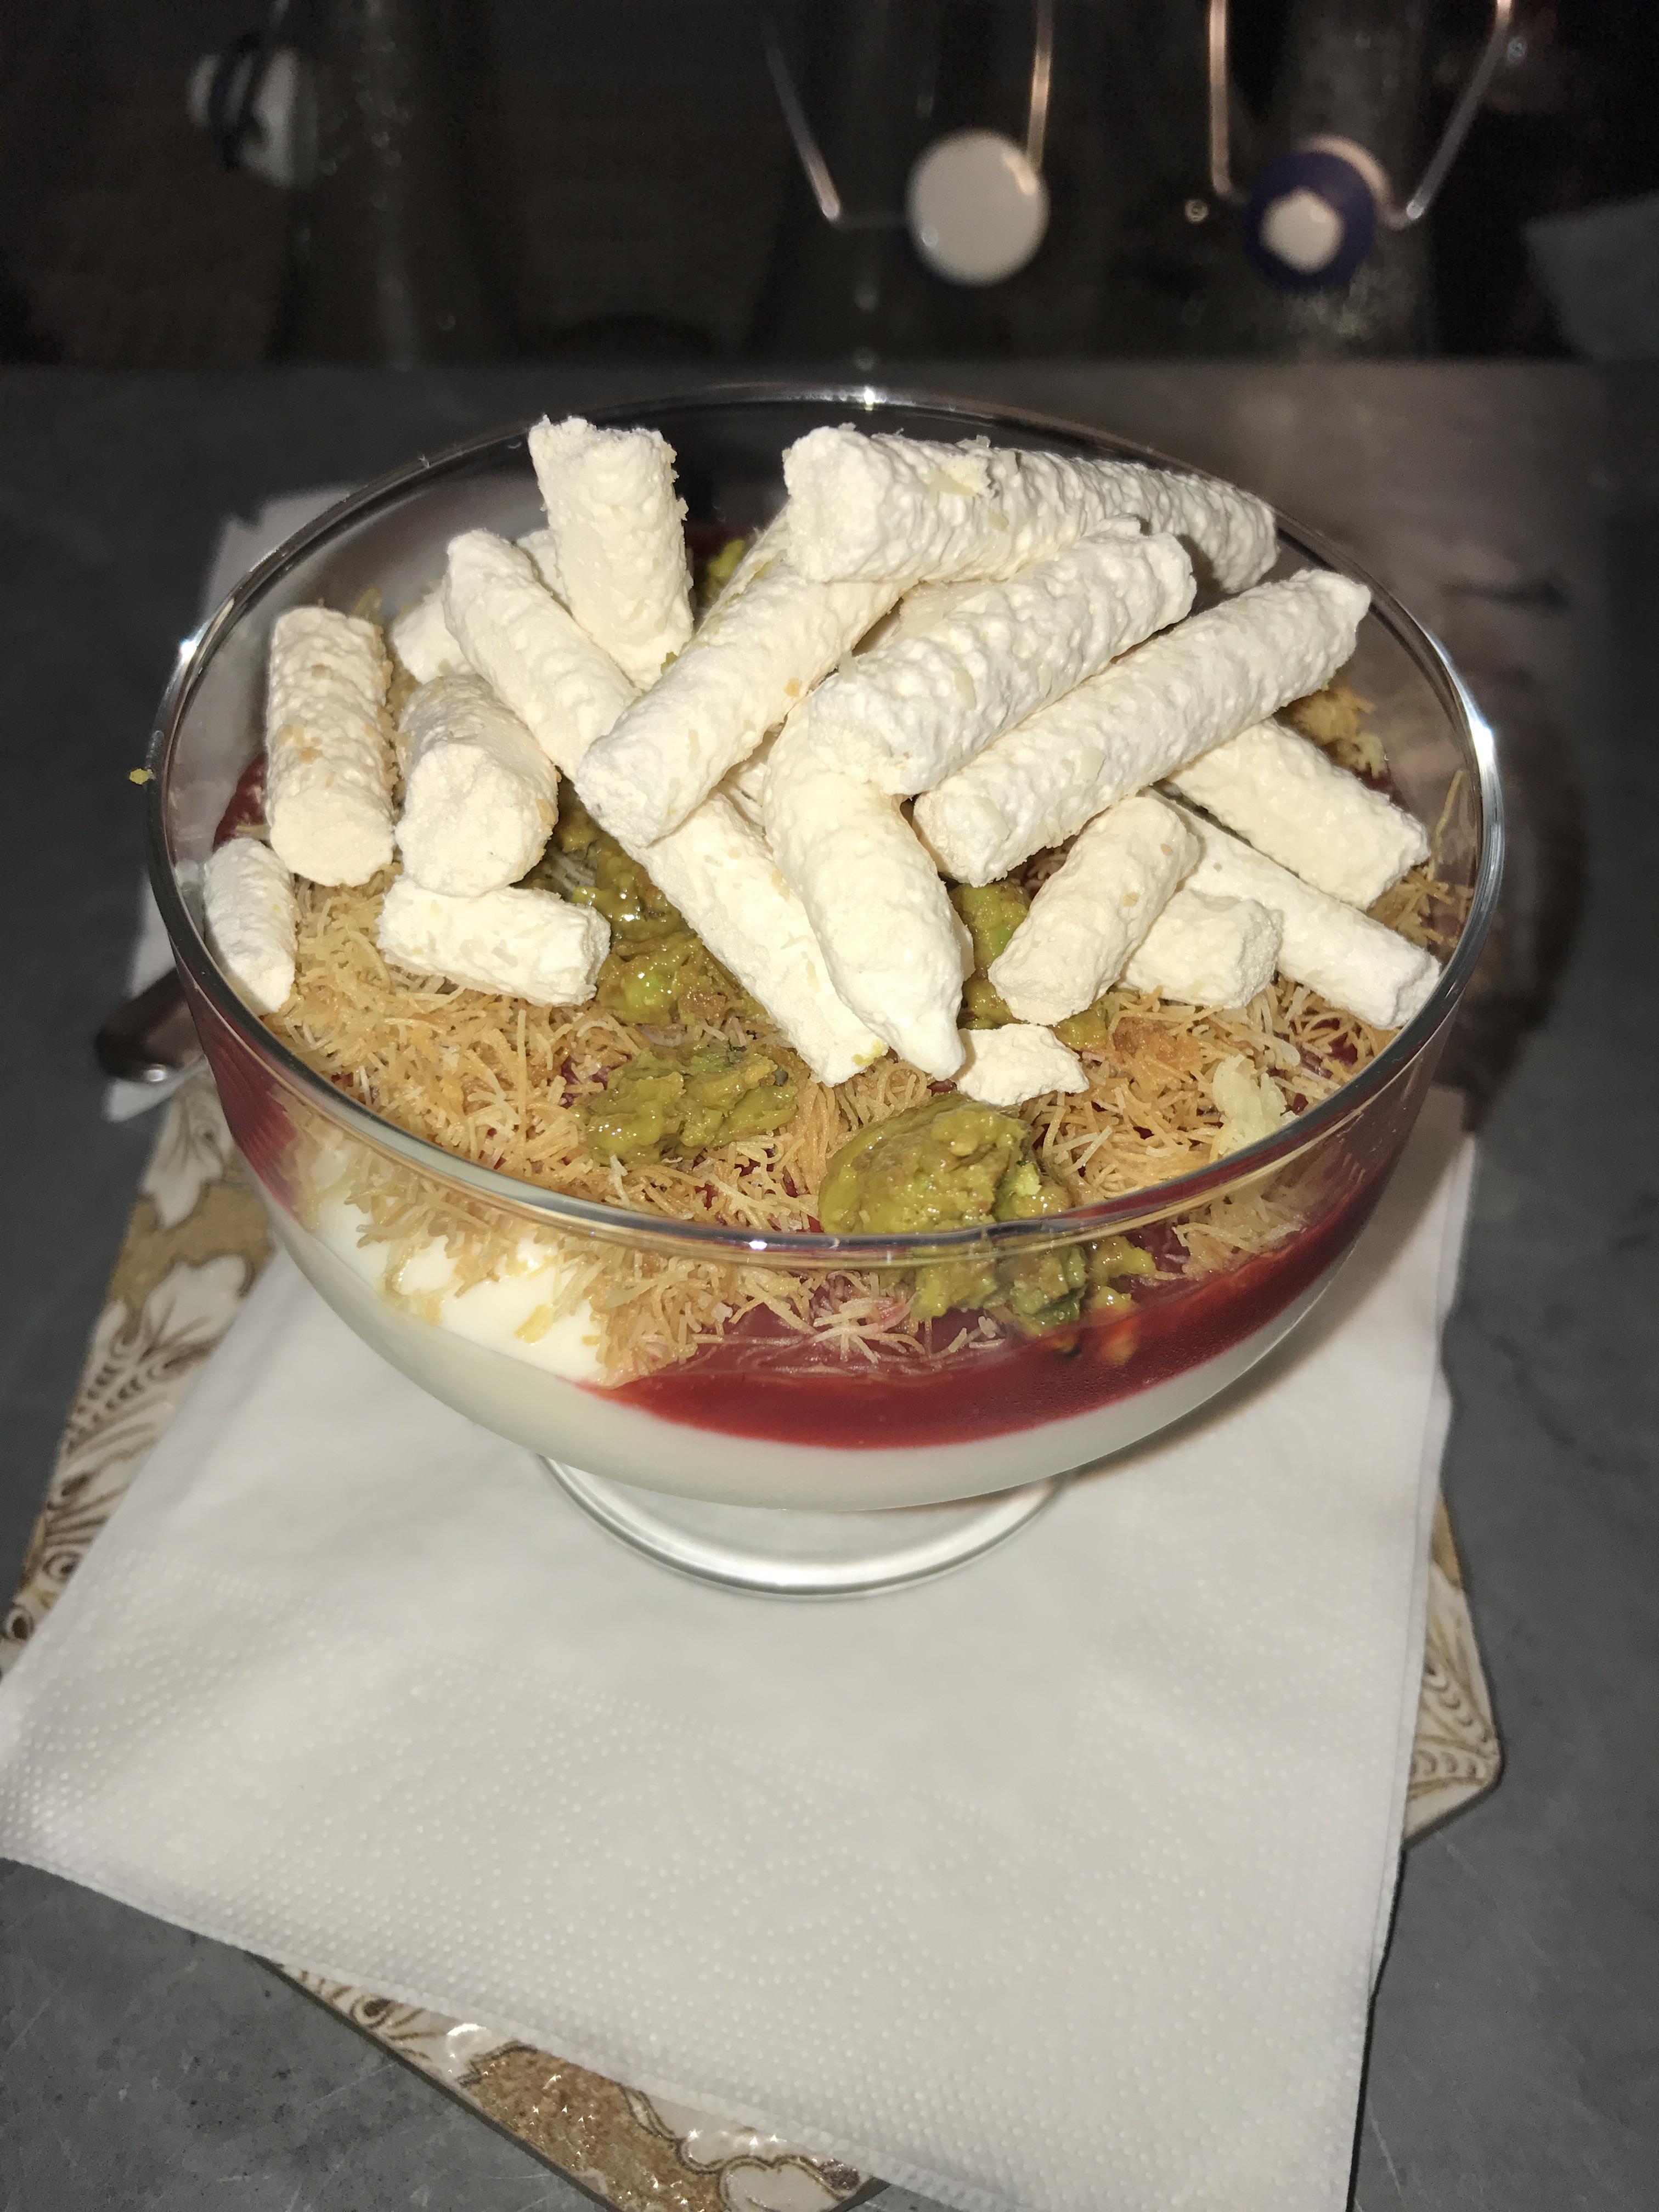 LondonsDiningCouple Palomar Restaurant Review | Top 10 Desserts in London